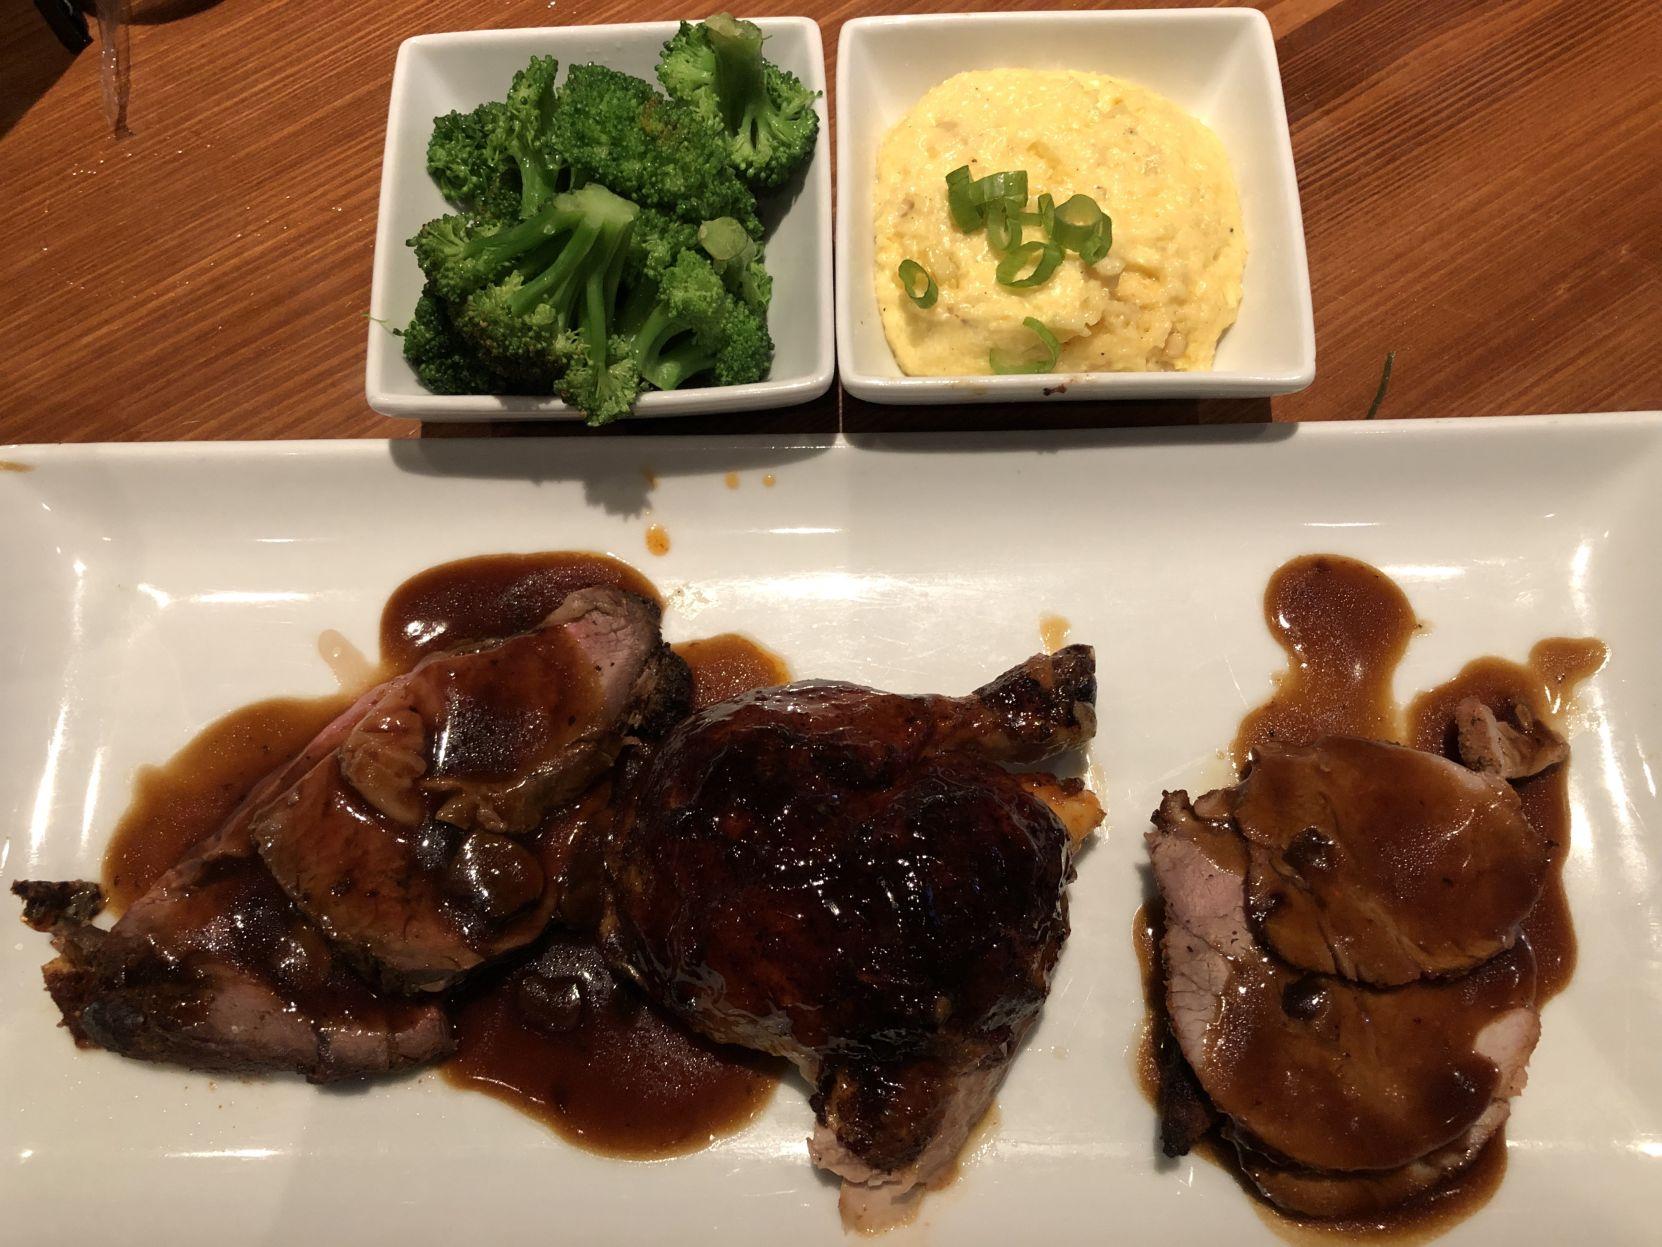 Restaurant review Zea brings new design, menu classics to